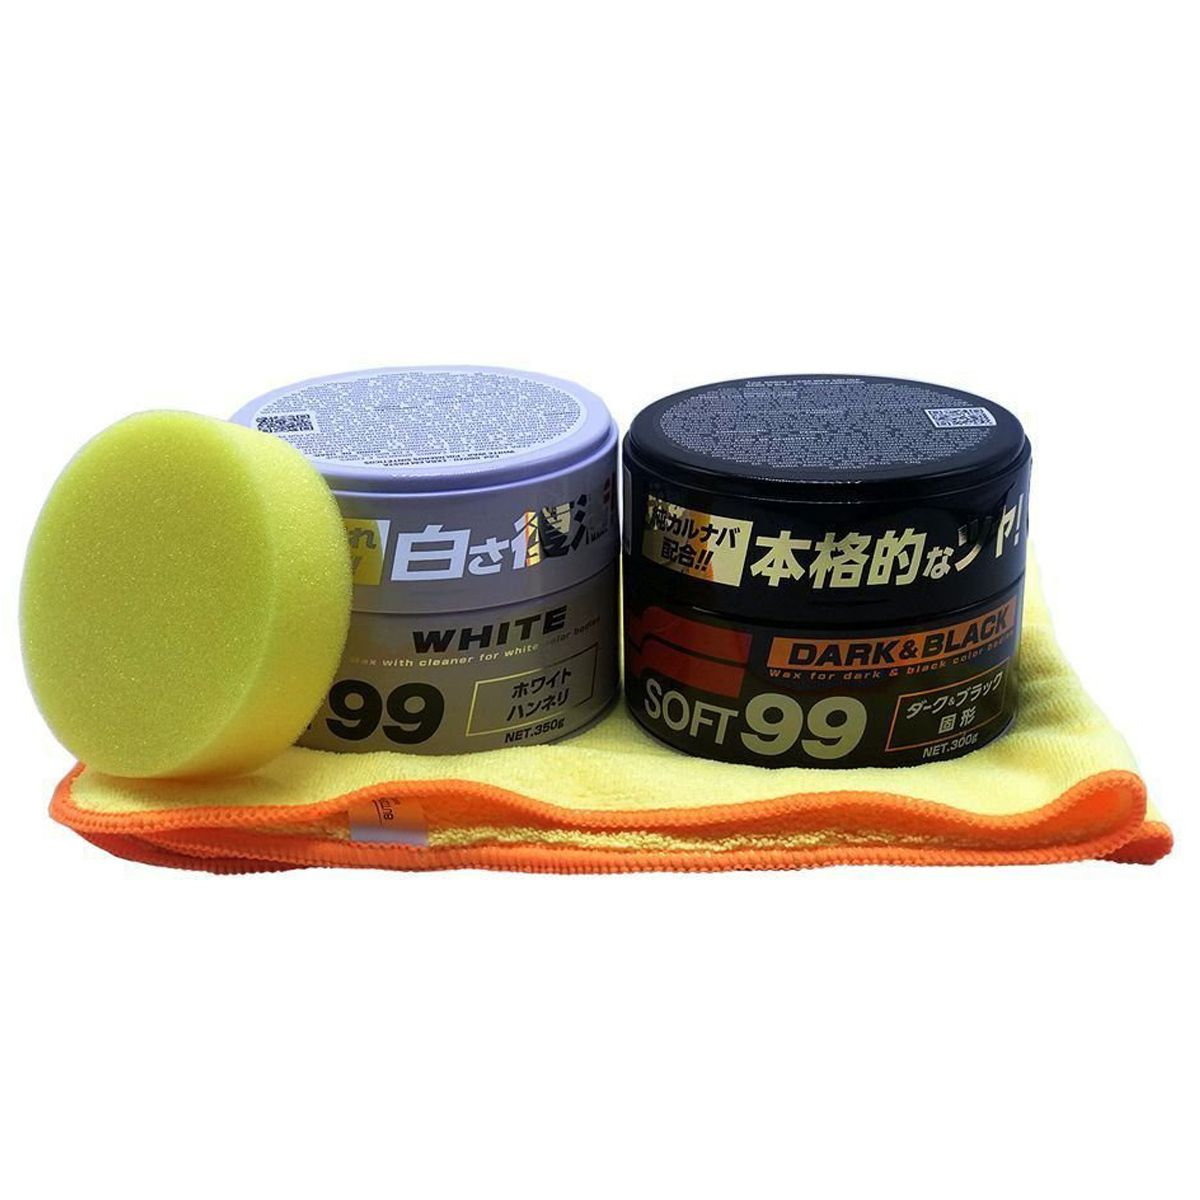 Kit Cera Dark & Black Soft99 + Cera White Soft99 + Flanela 40x60 cadillac